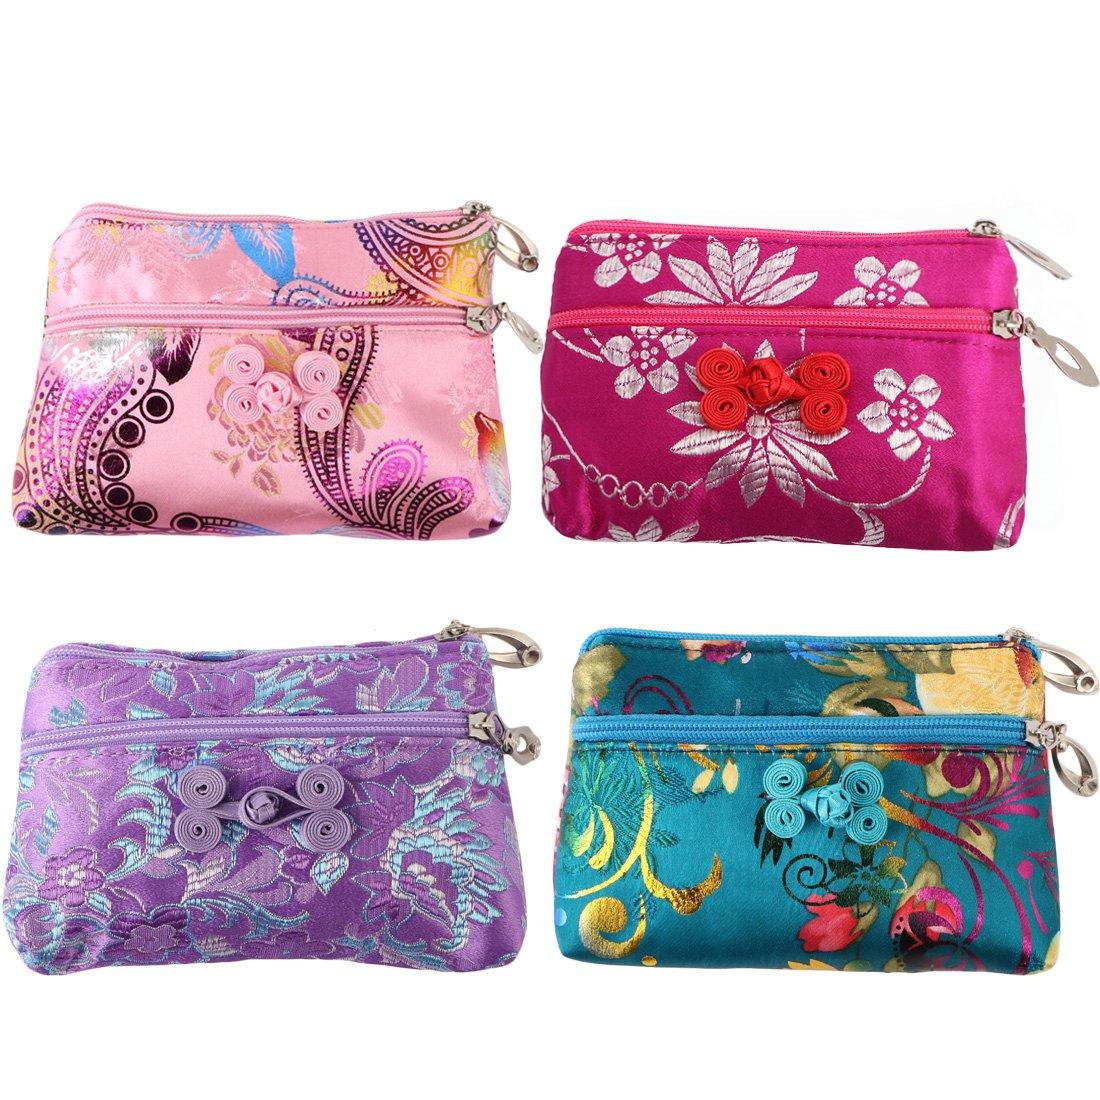 kilofly 4pc Chinese Silk Brocade 2 Zipper Purse Jewelry Pouch Bag Value Set